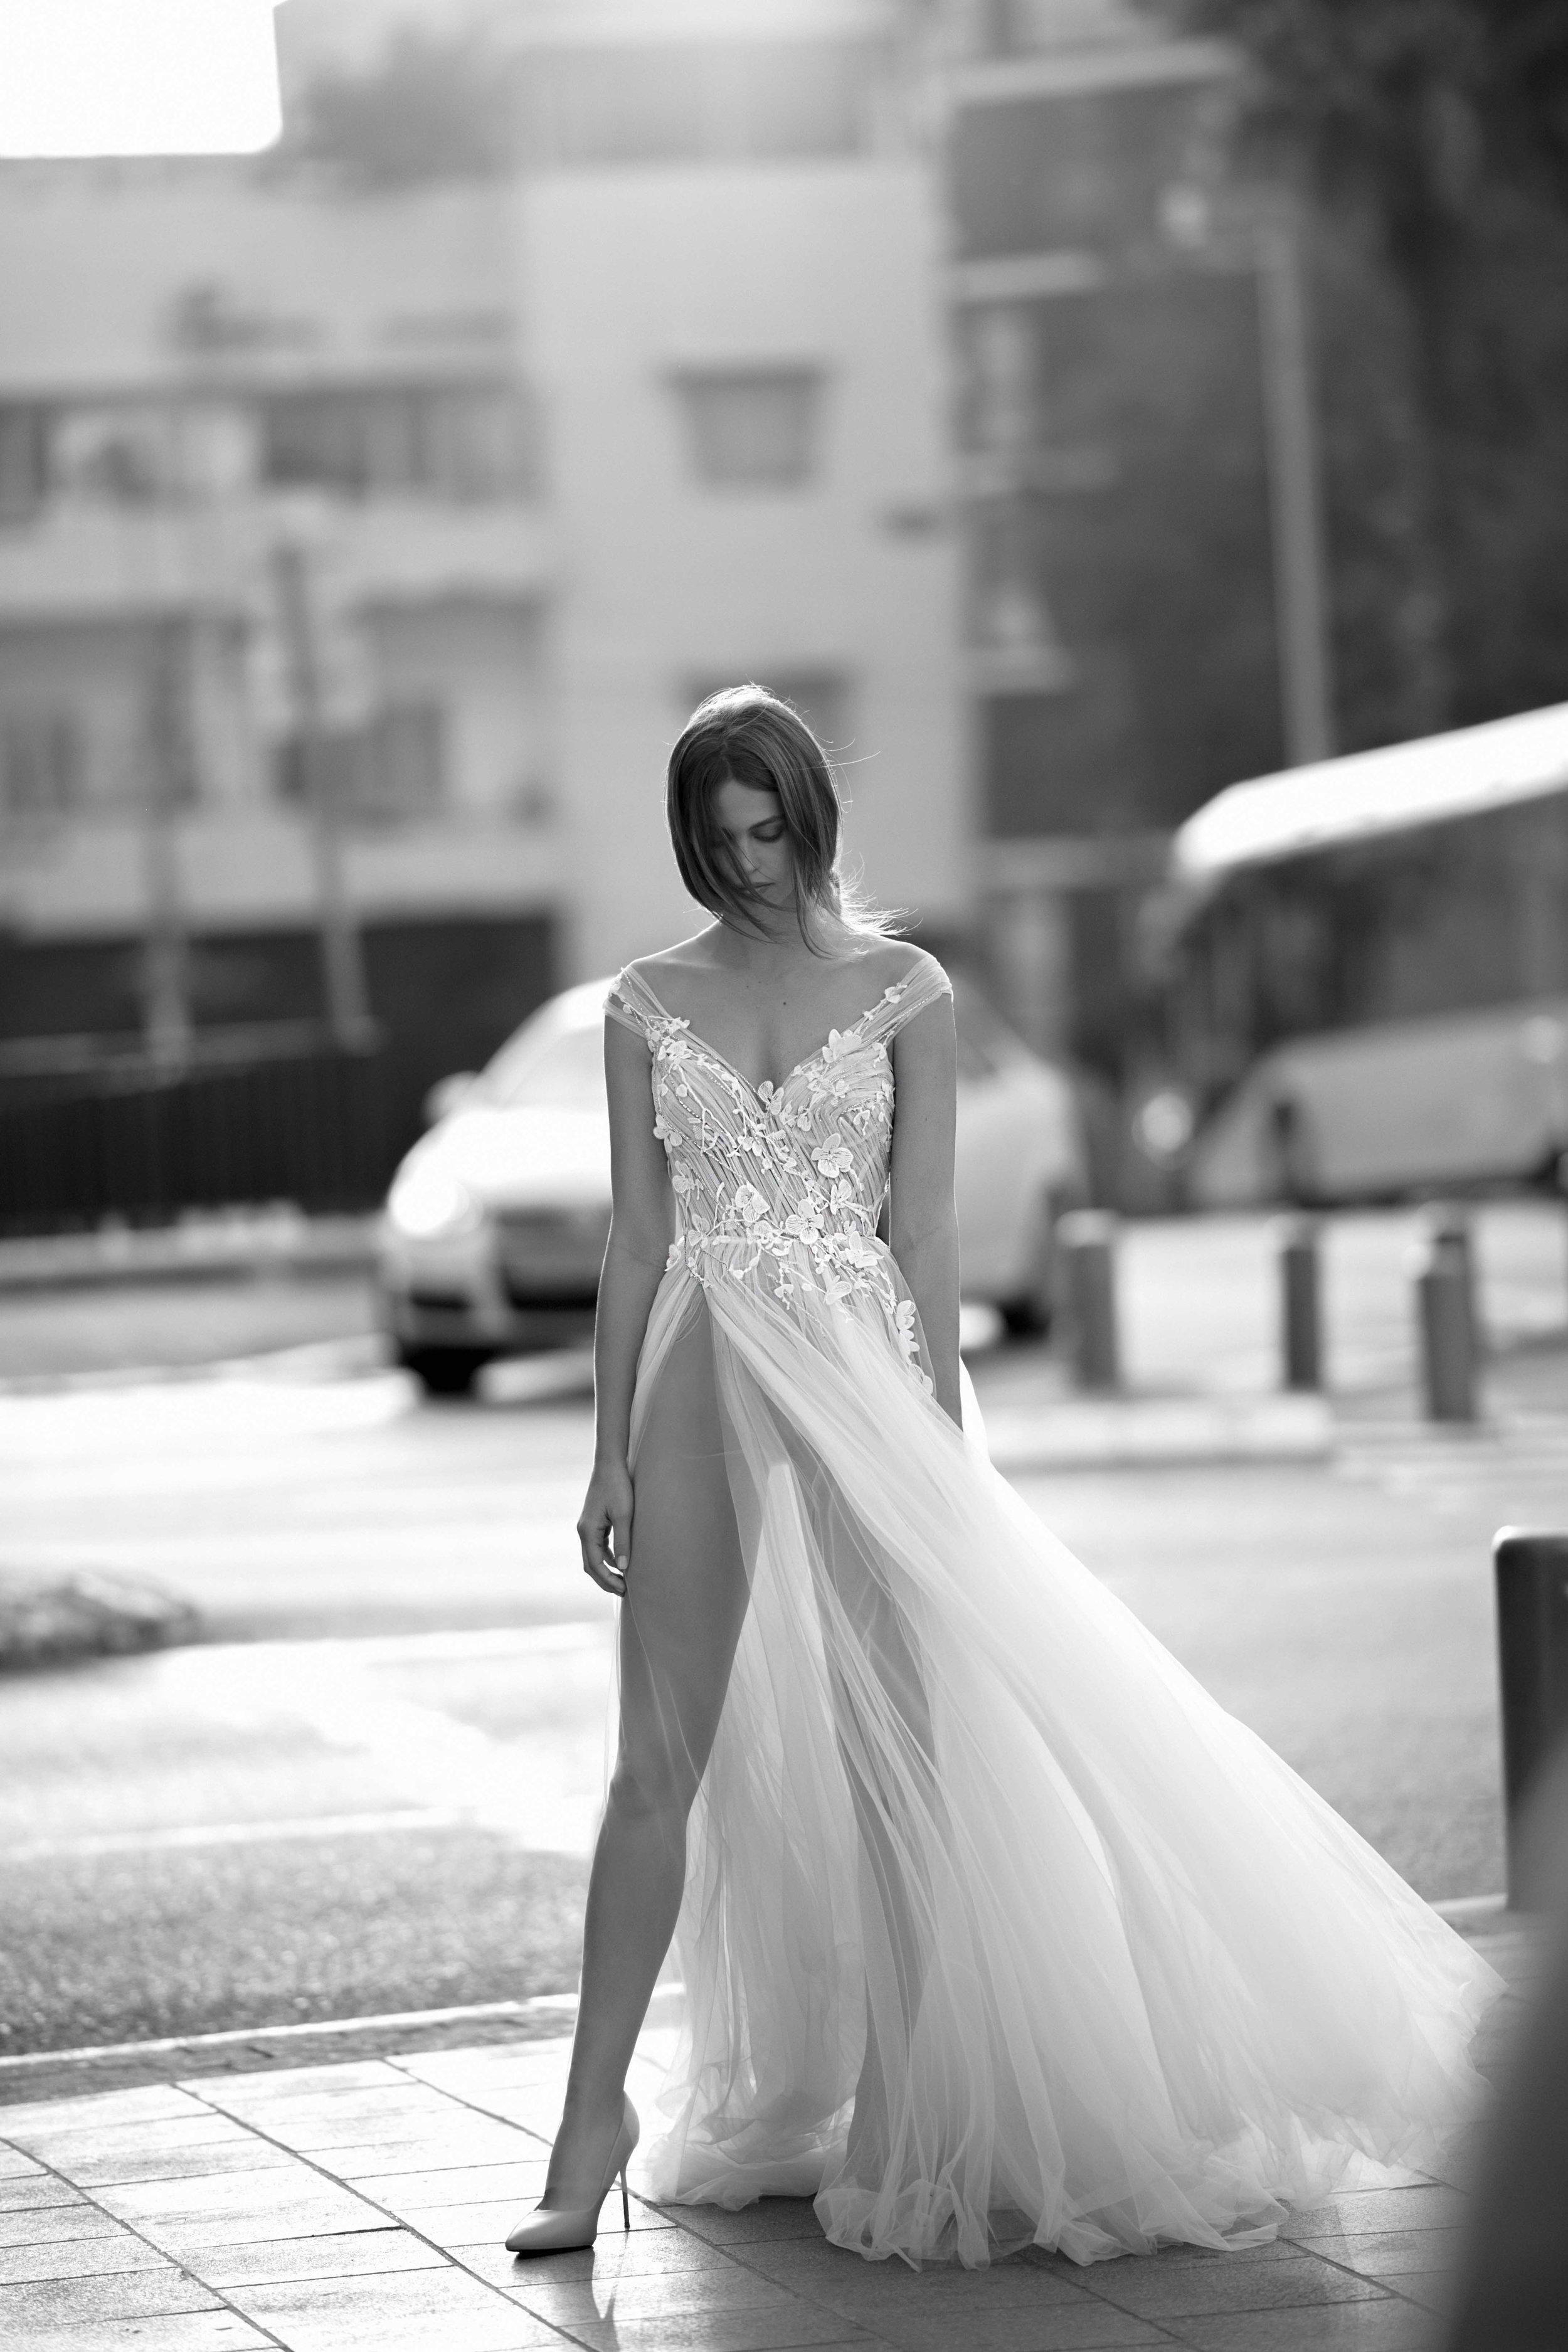 International Designer LIZ MARTINEZ on the LOVE FIND CO. Bridal Directory